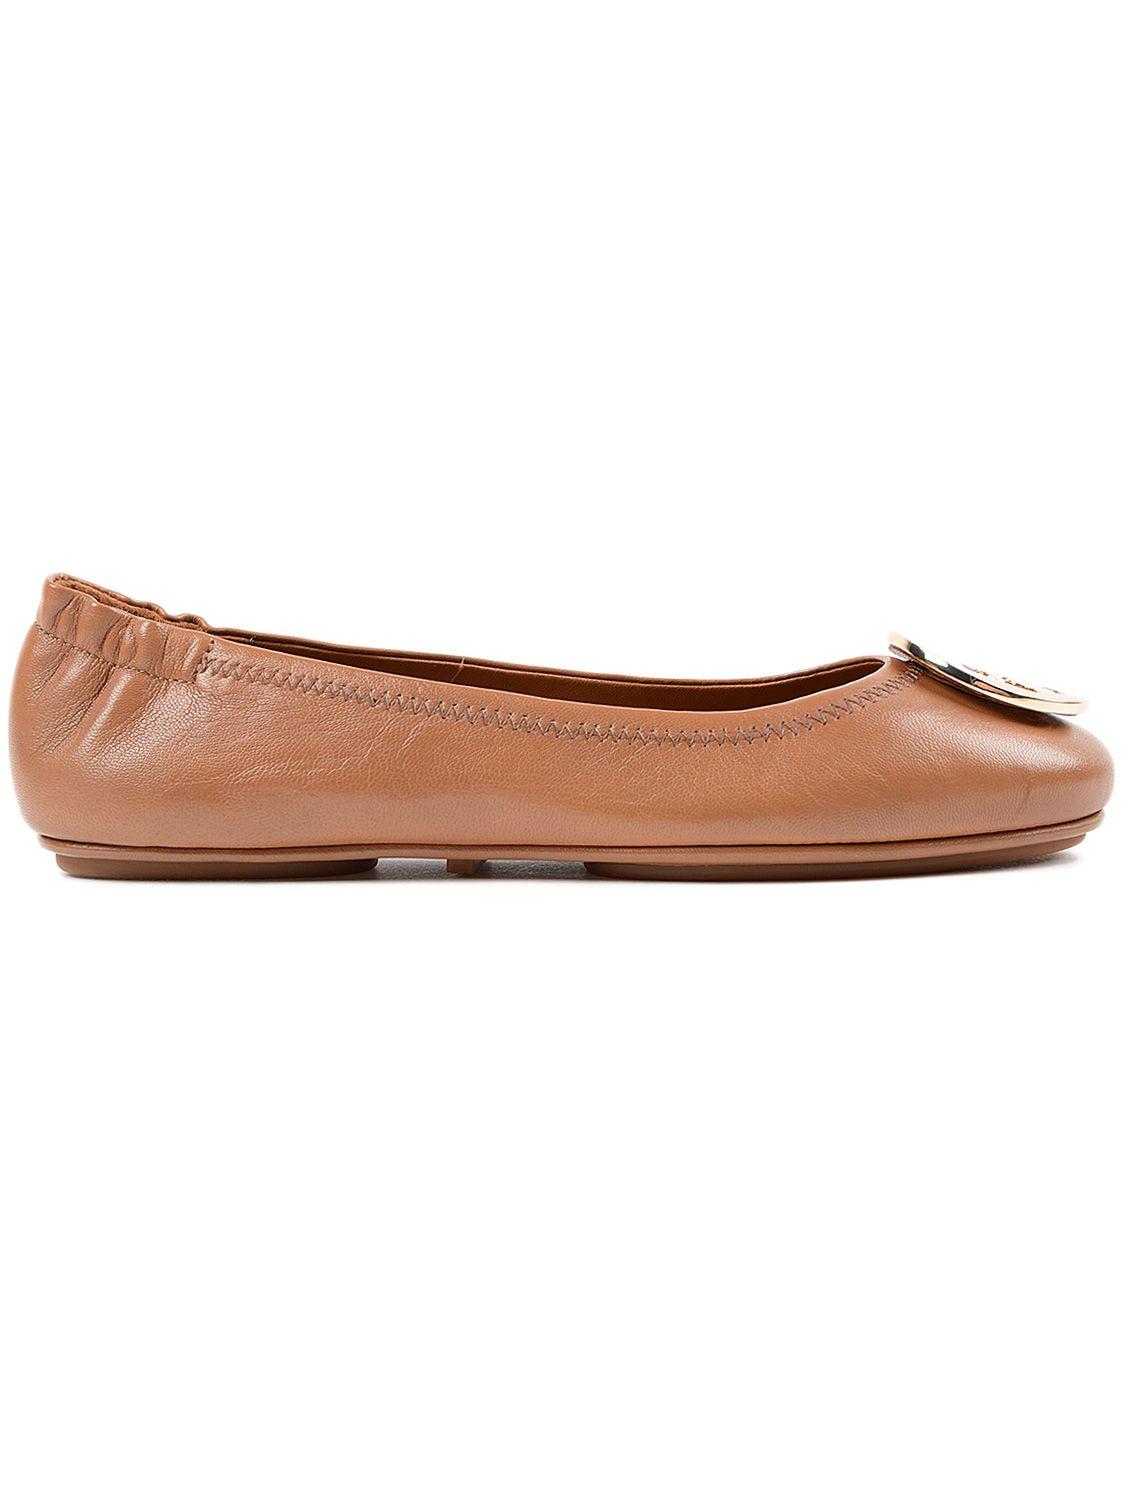 tory burch tory burch minnie ballerinas brown women 39 s flat shoes italist. Black Bedroom Furniture Sets. Home Design Ideas